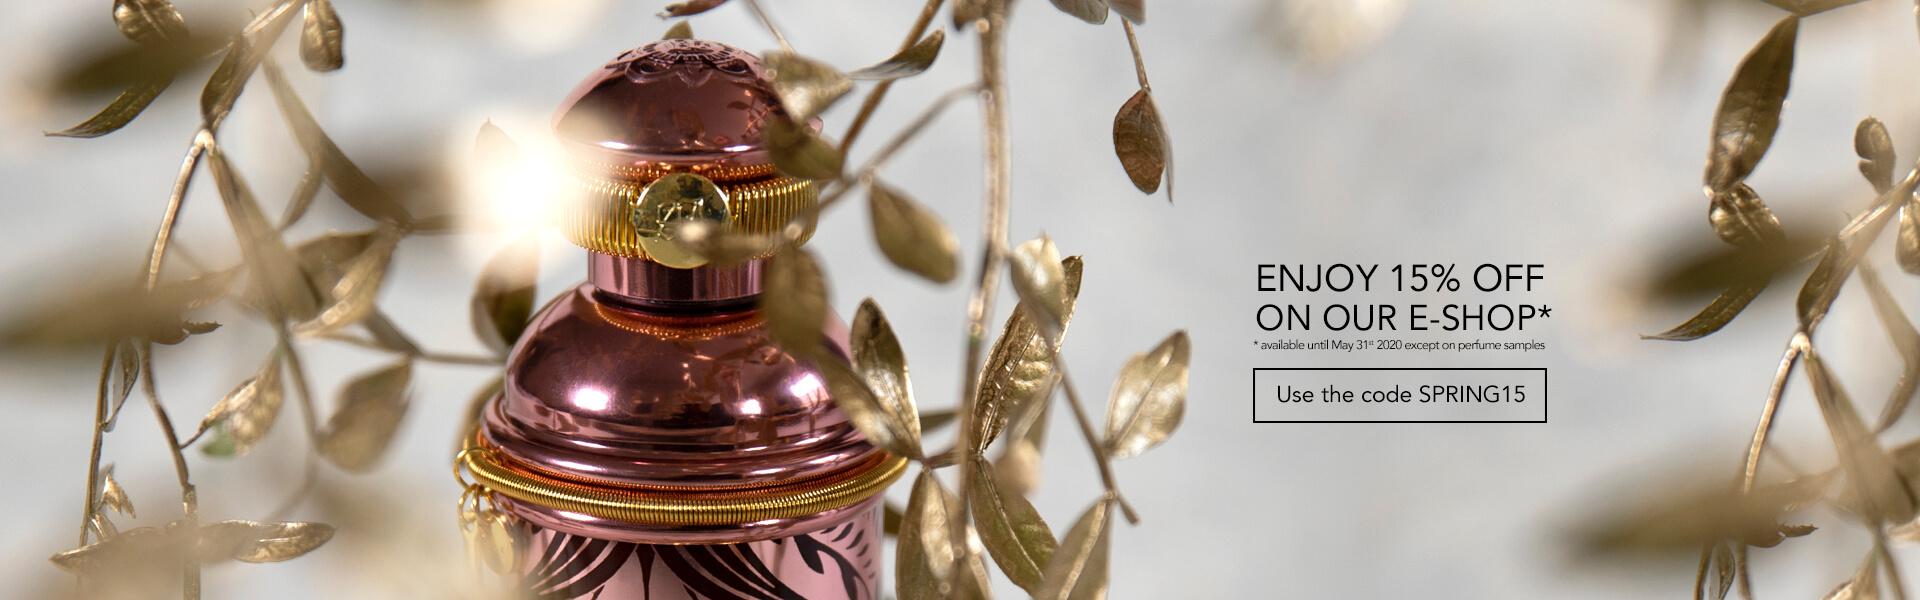 Perfume banner3